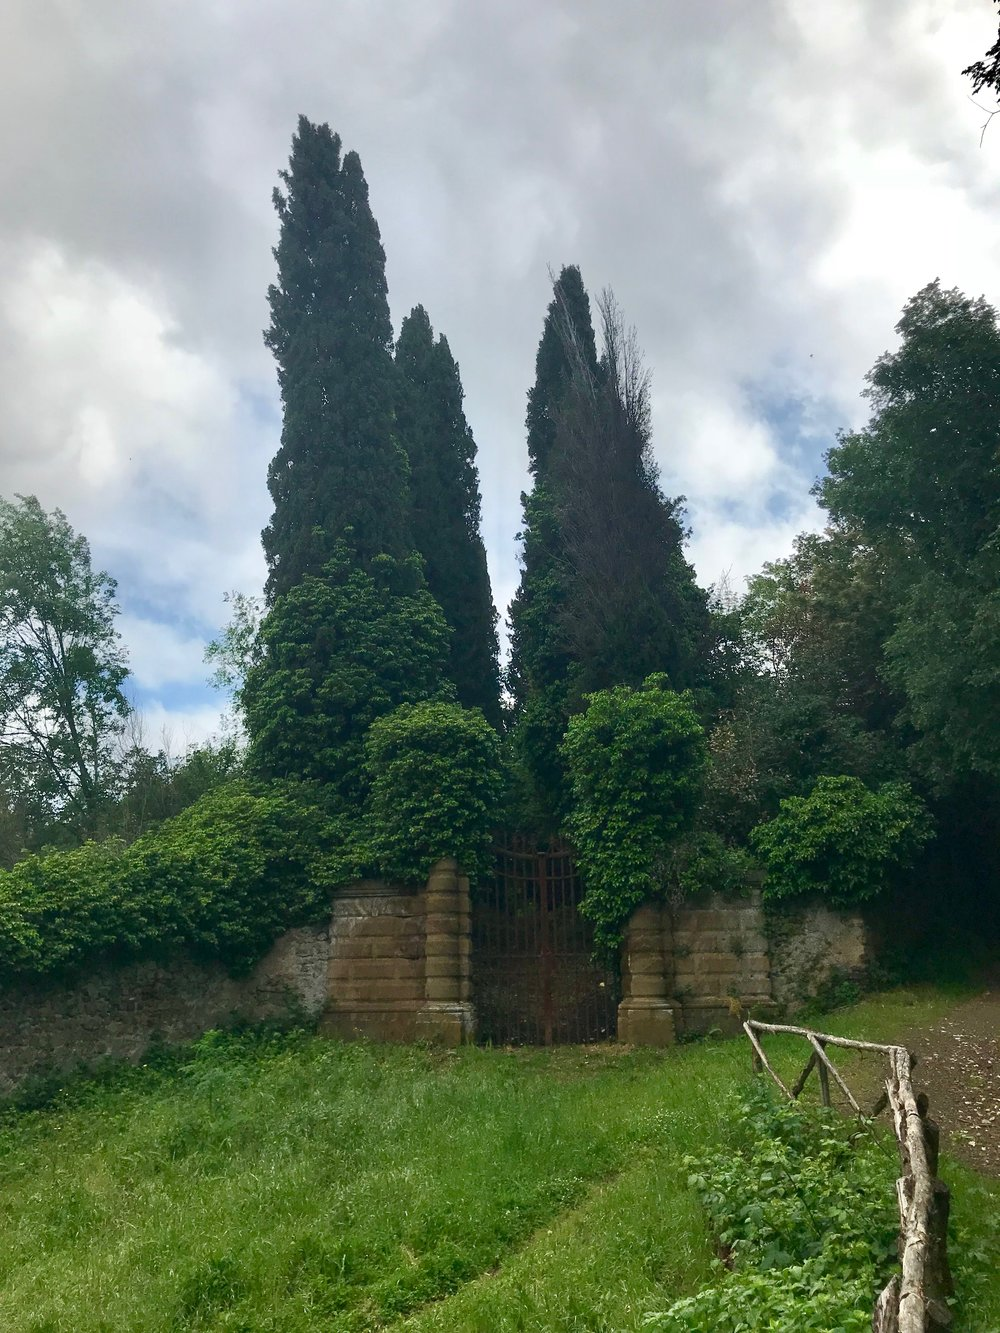 Old regal gates